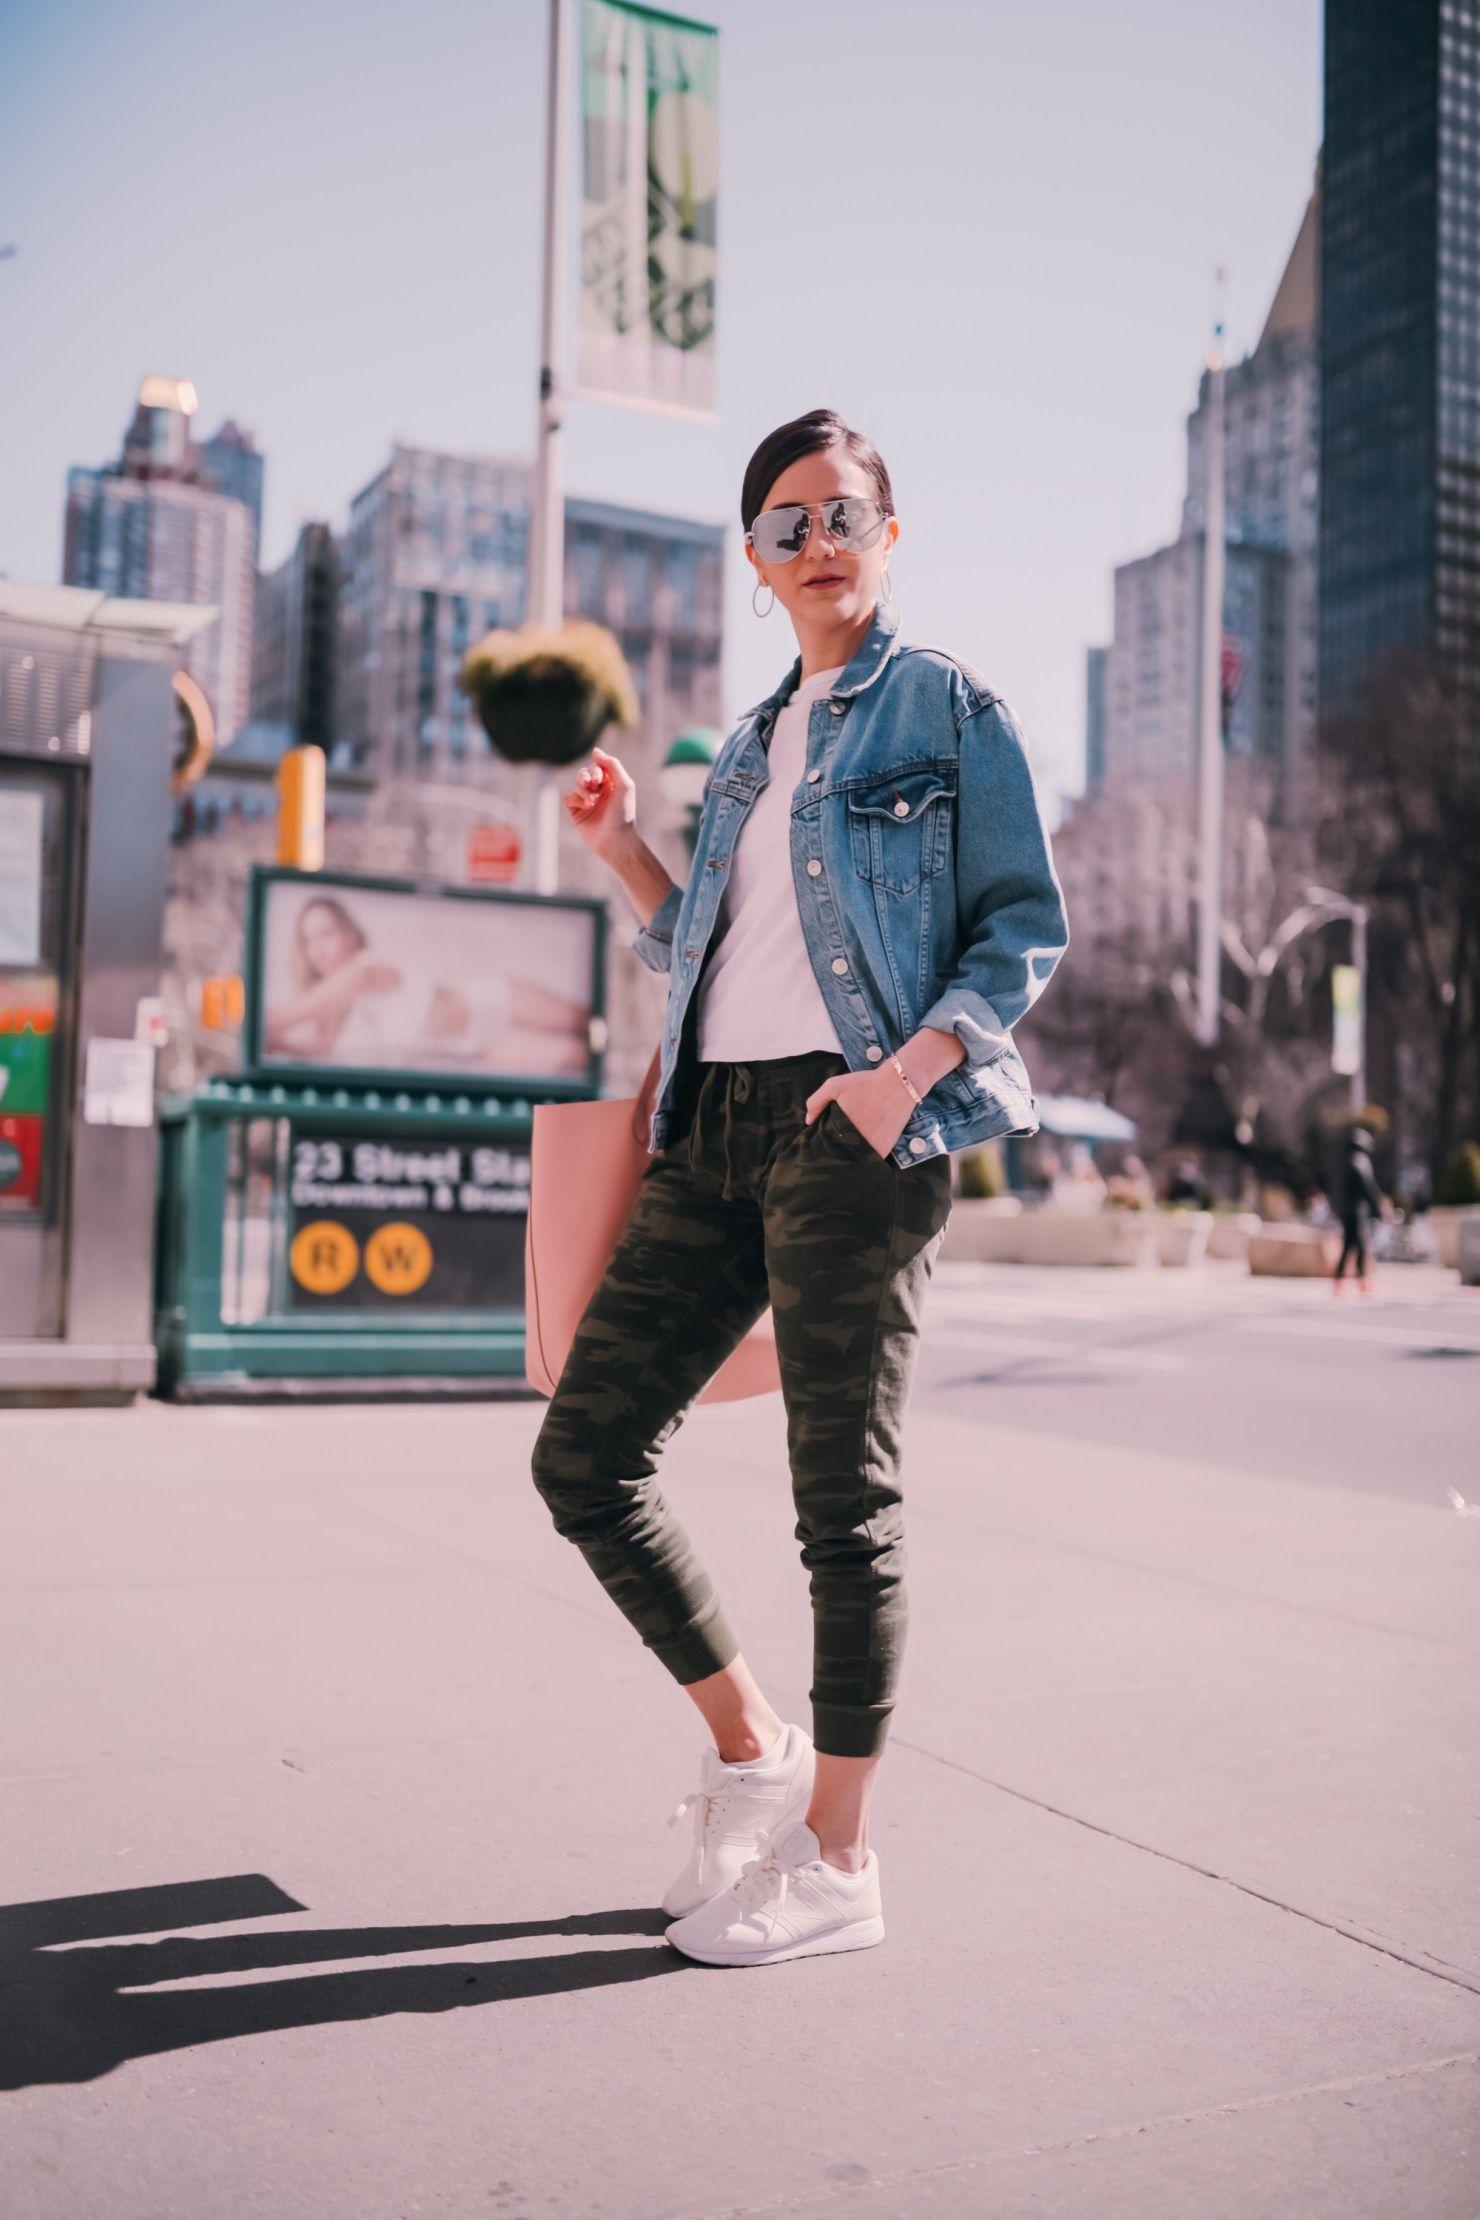 Camo Joggers With An Oversized Denim Jacket Camo Joggers How To Wear Sneakers Oversized Denim Jacket [ 2220 x 1480 Pixel ]